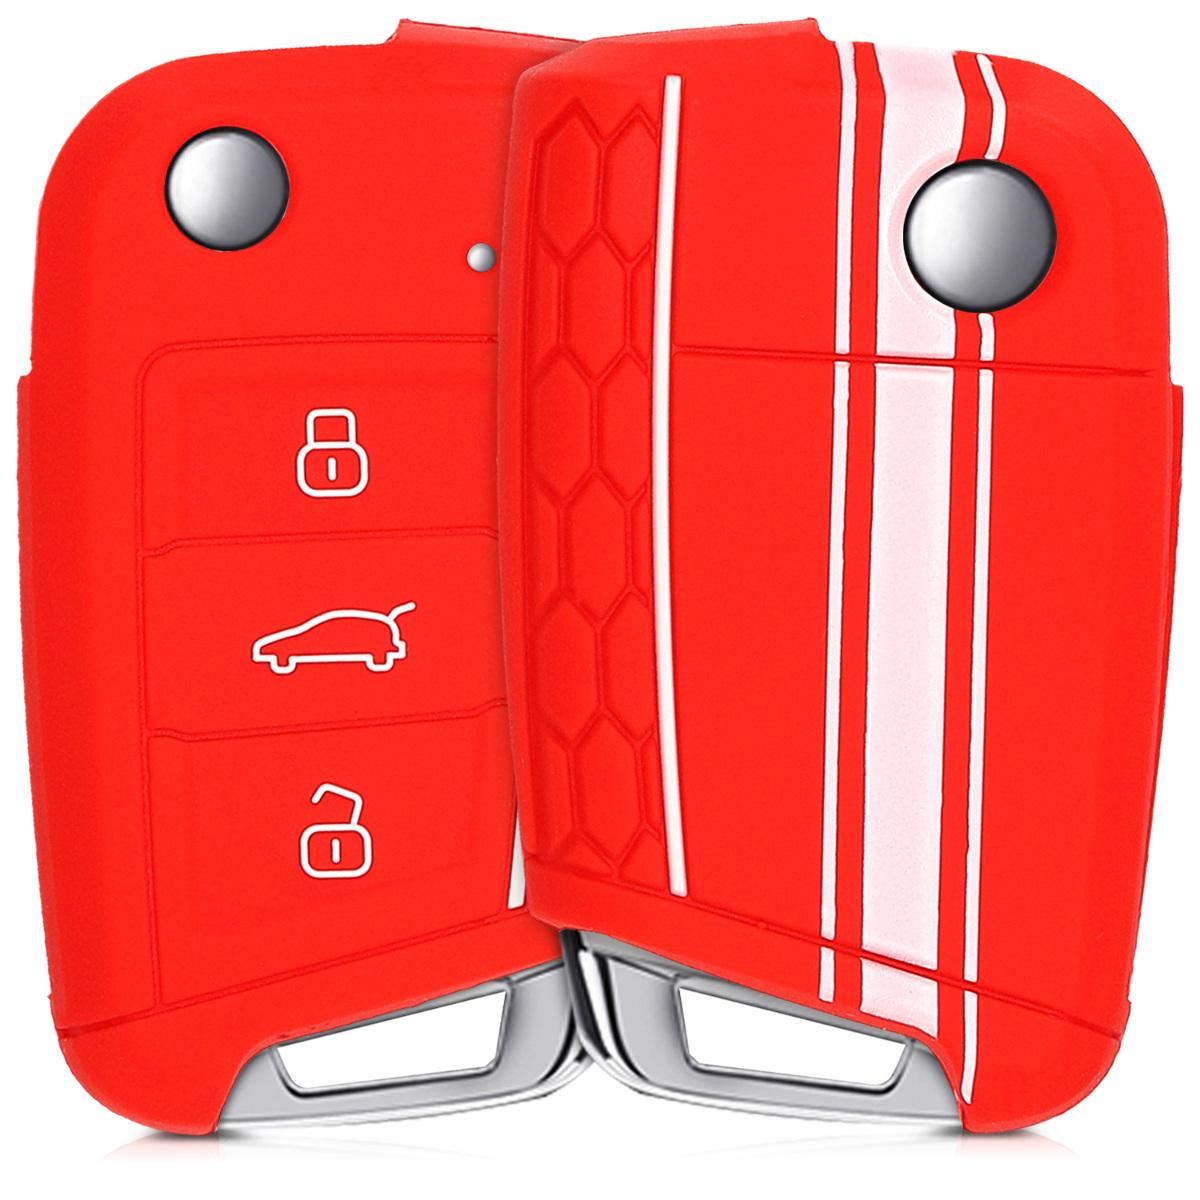 KW Θήκη Κλειδιού VW Golf 7 MK7 - Σιλικόνη - 3 Κουμπιά - White / Red (42888.18)